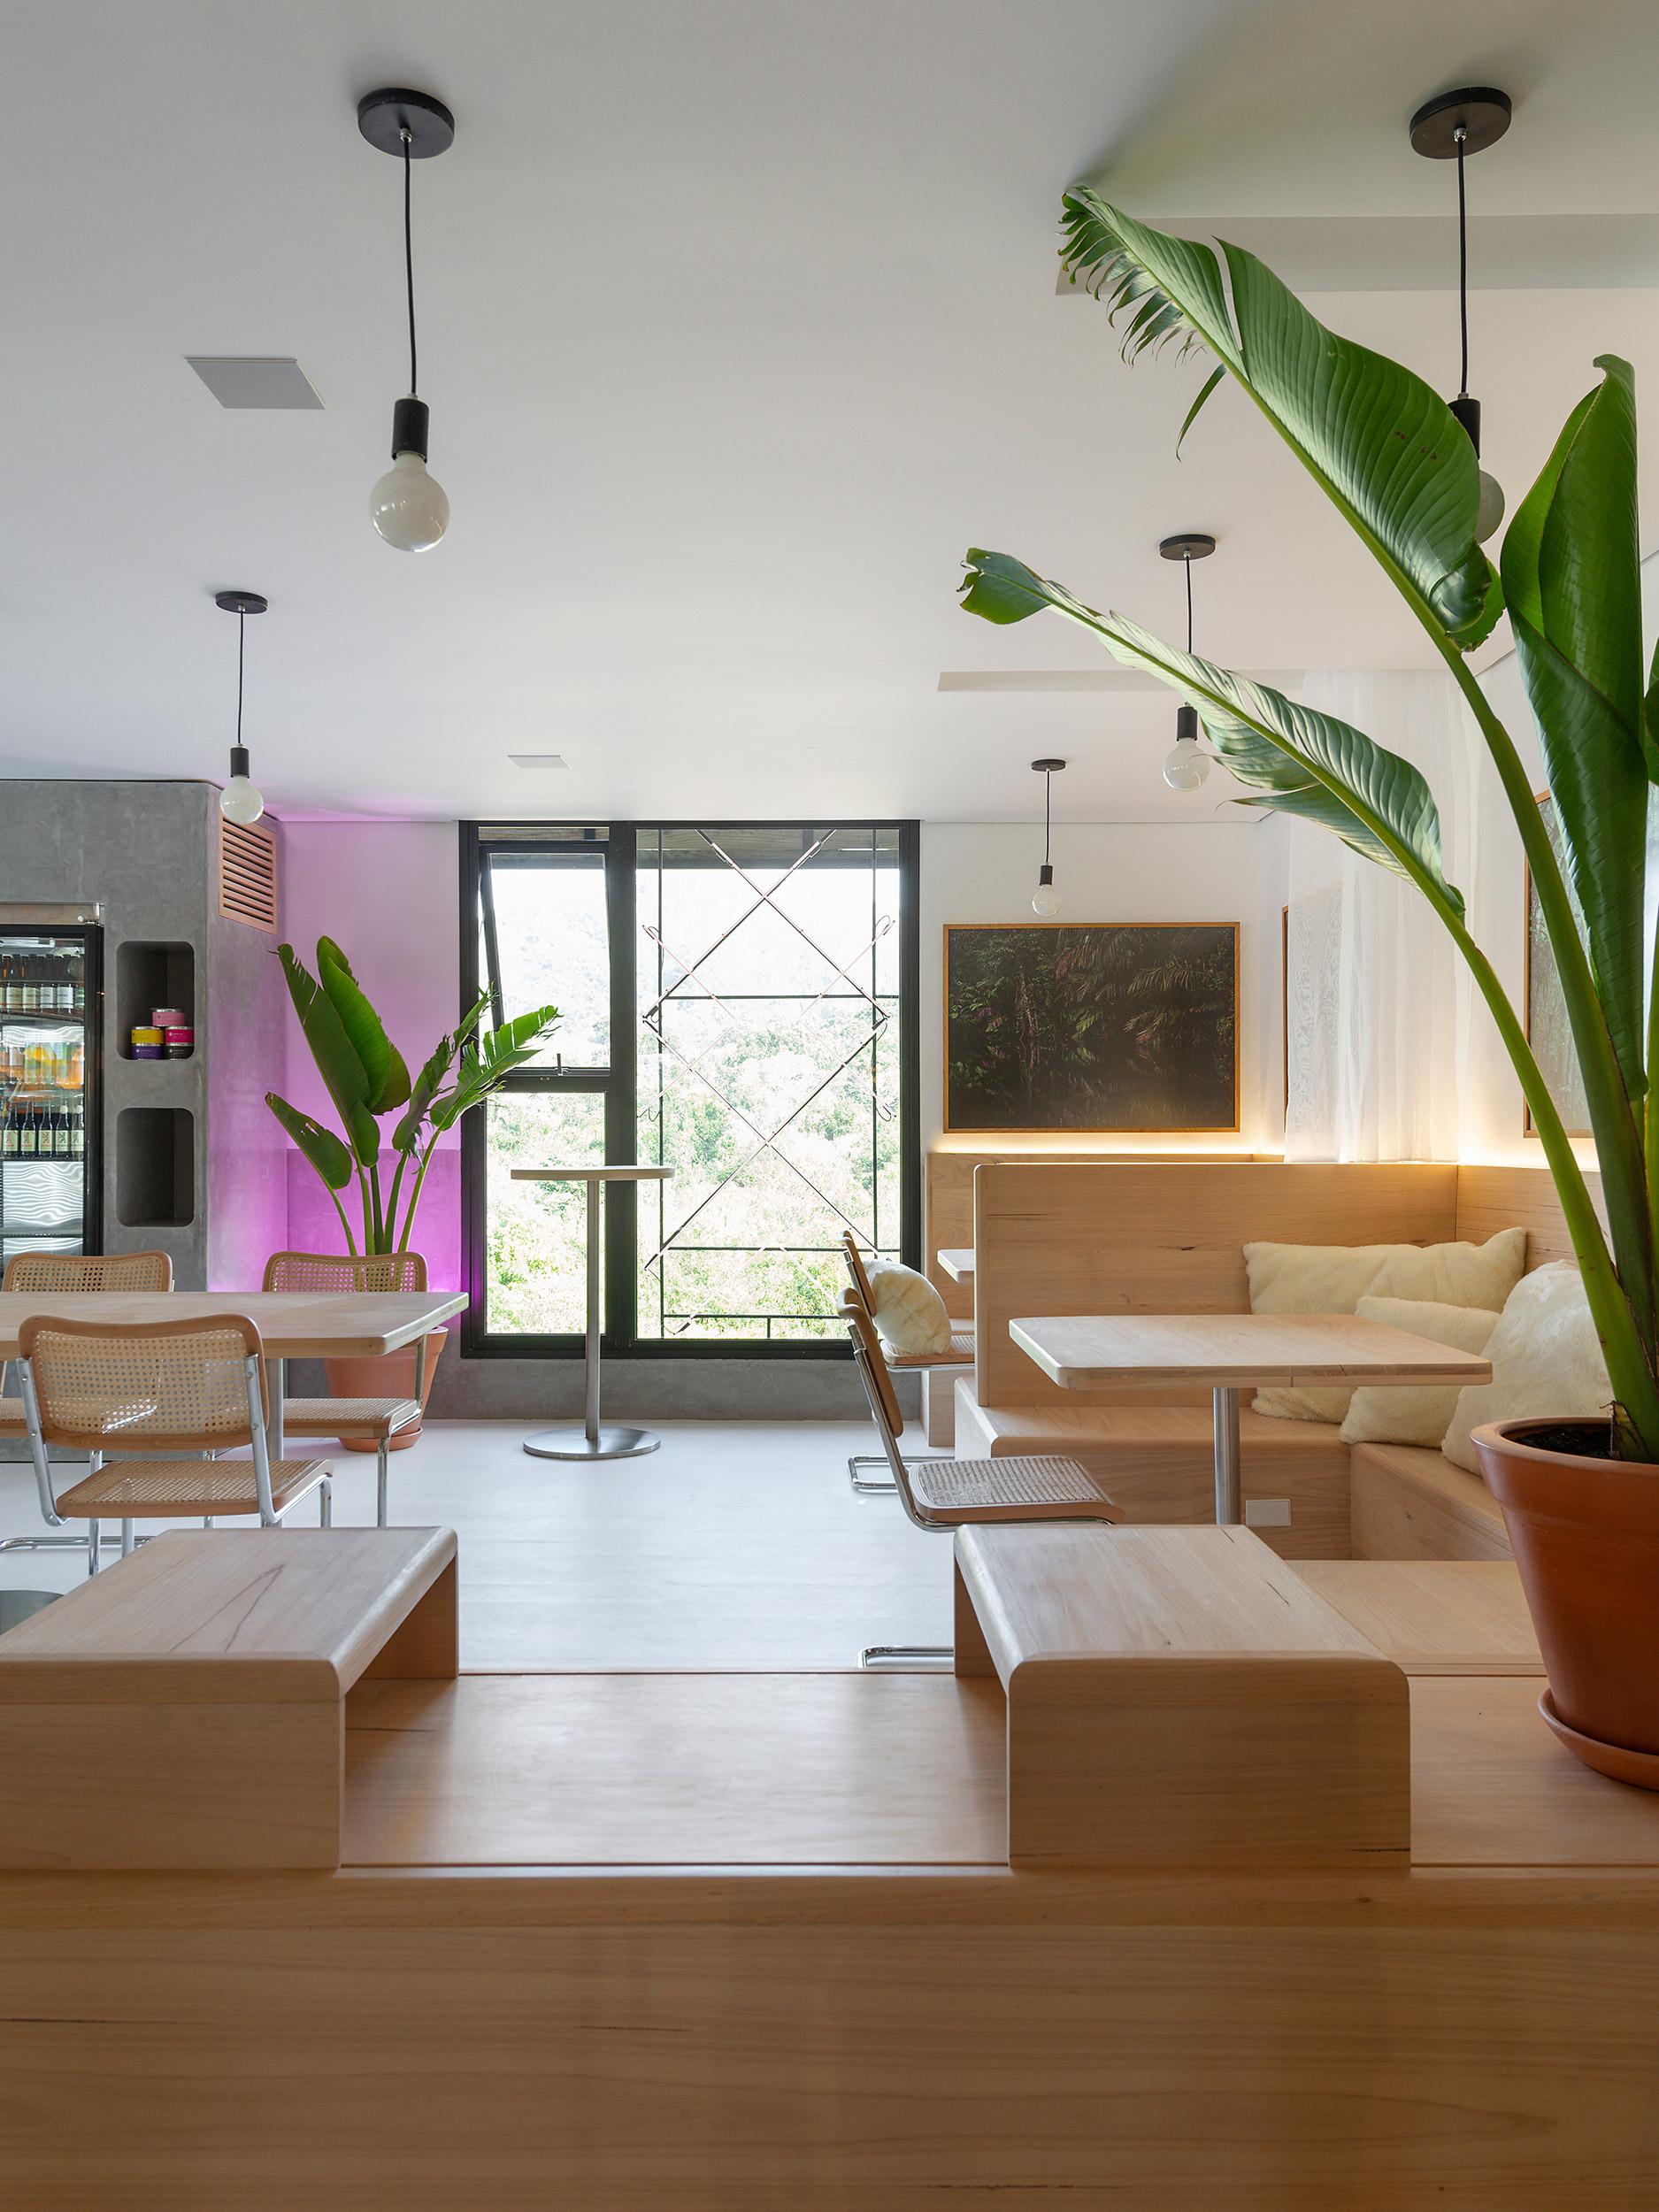 Café +UM - Emanuella Wojcikiewicz Studio. Projeto da CASACOR Santa Catarina 2021.